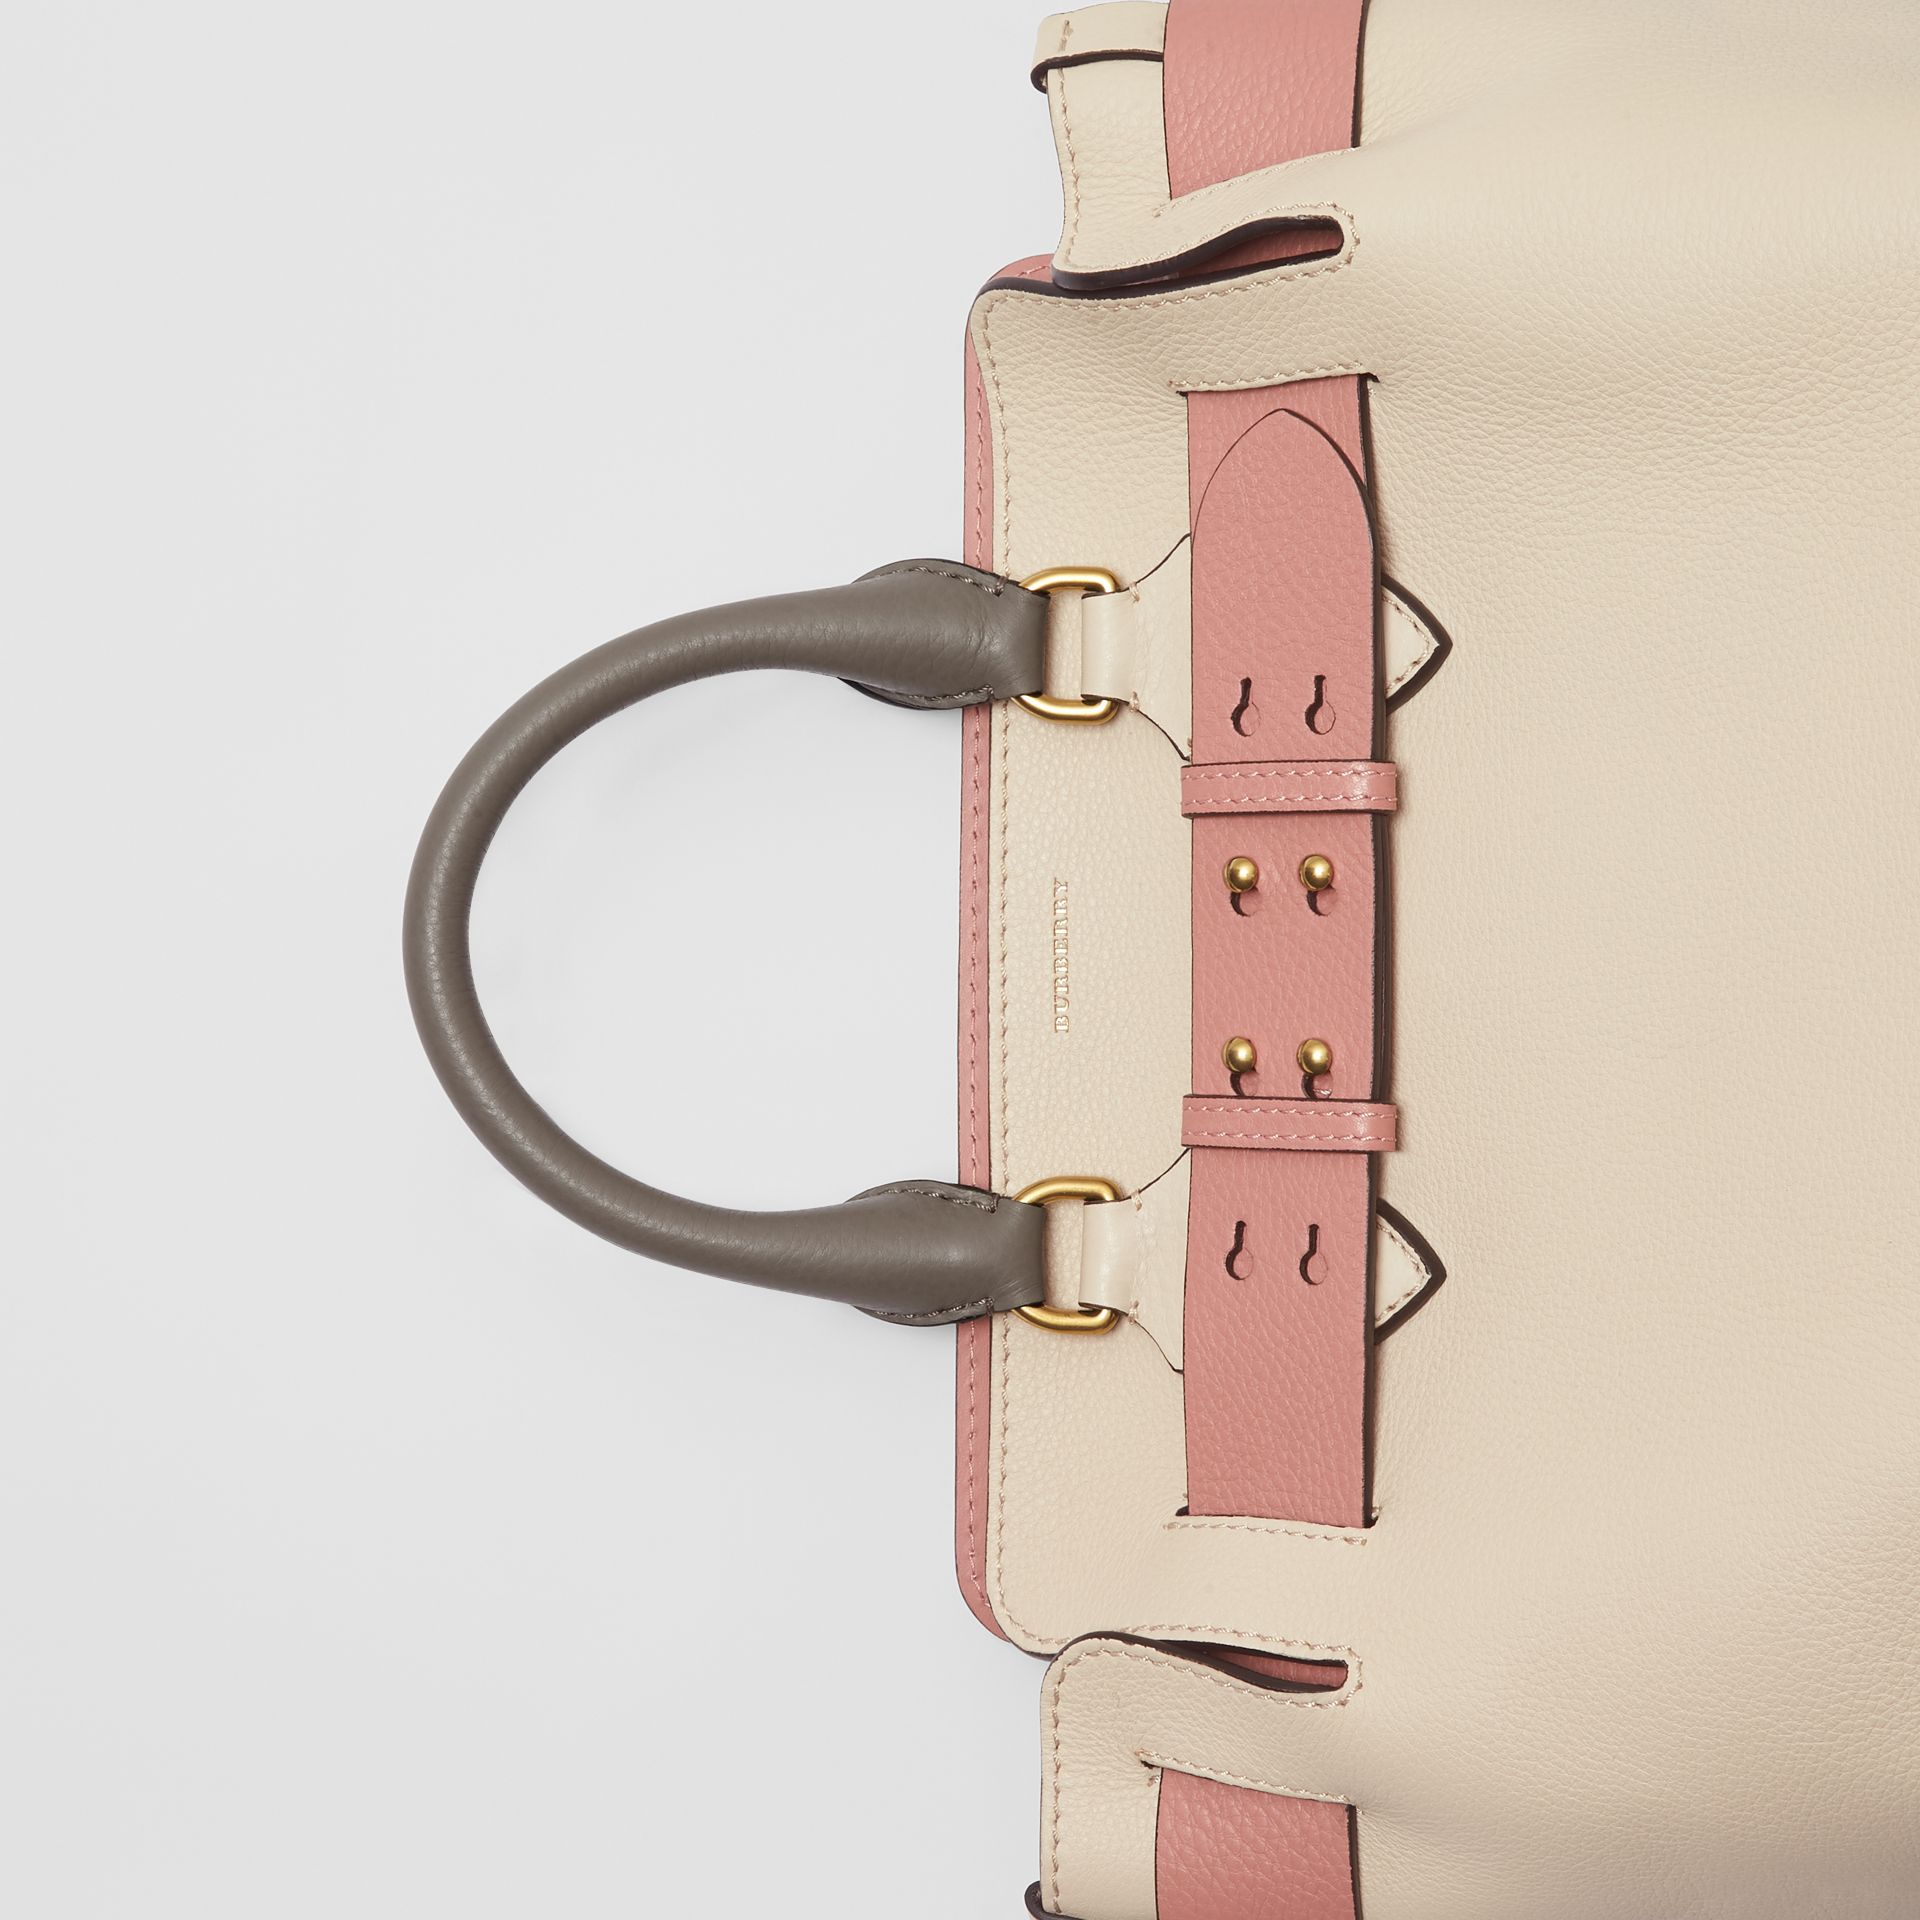 The Small Belt Bag aus Leder in Dreitonoptik (Kalksteinfarben/altrosenfarben) - Damen | Burberry - Galerie-Bild 1